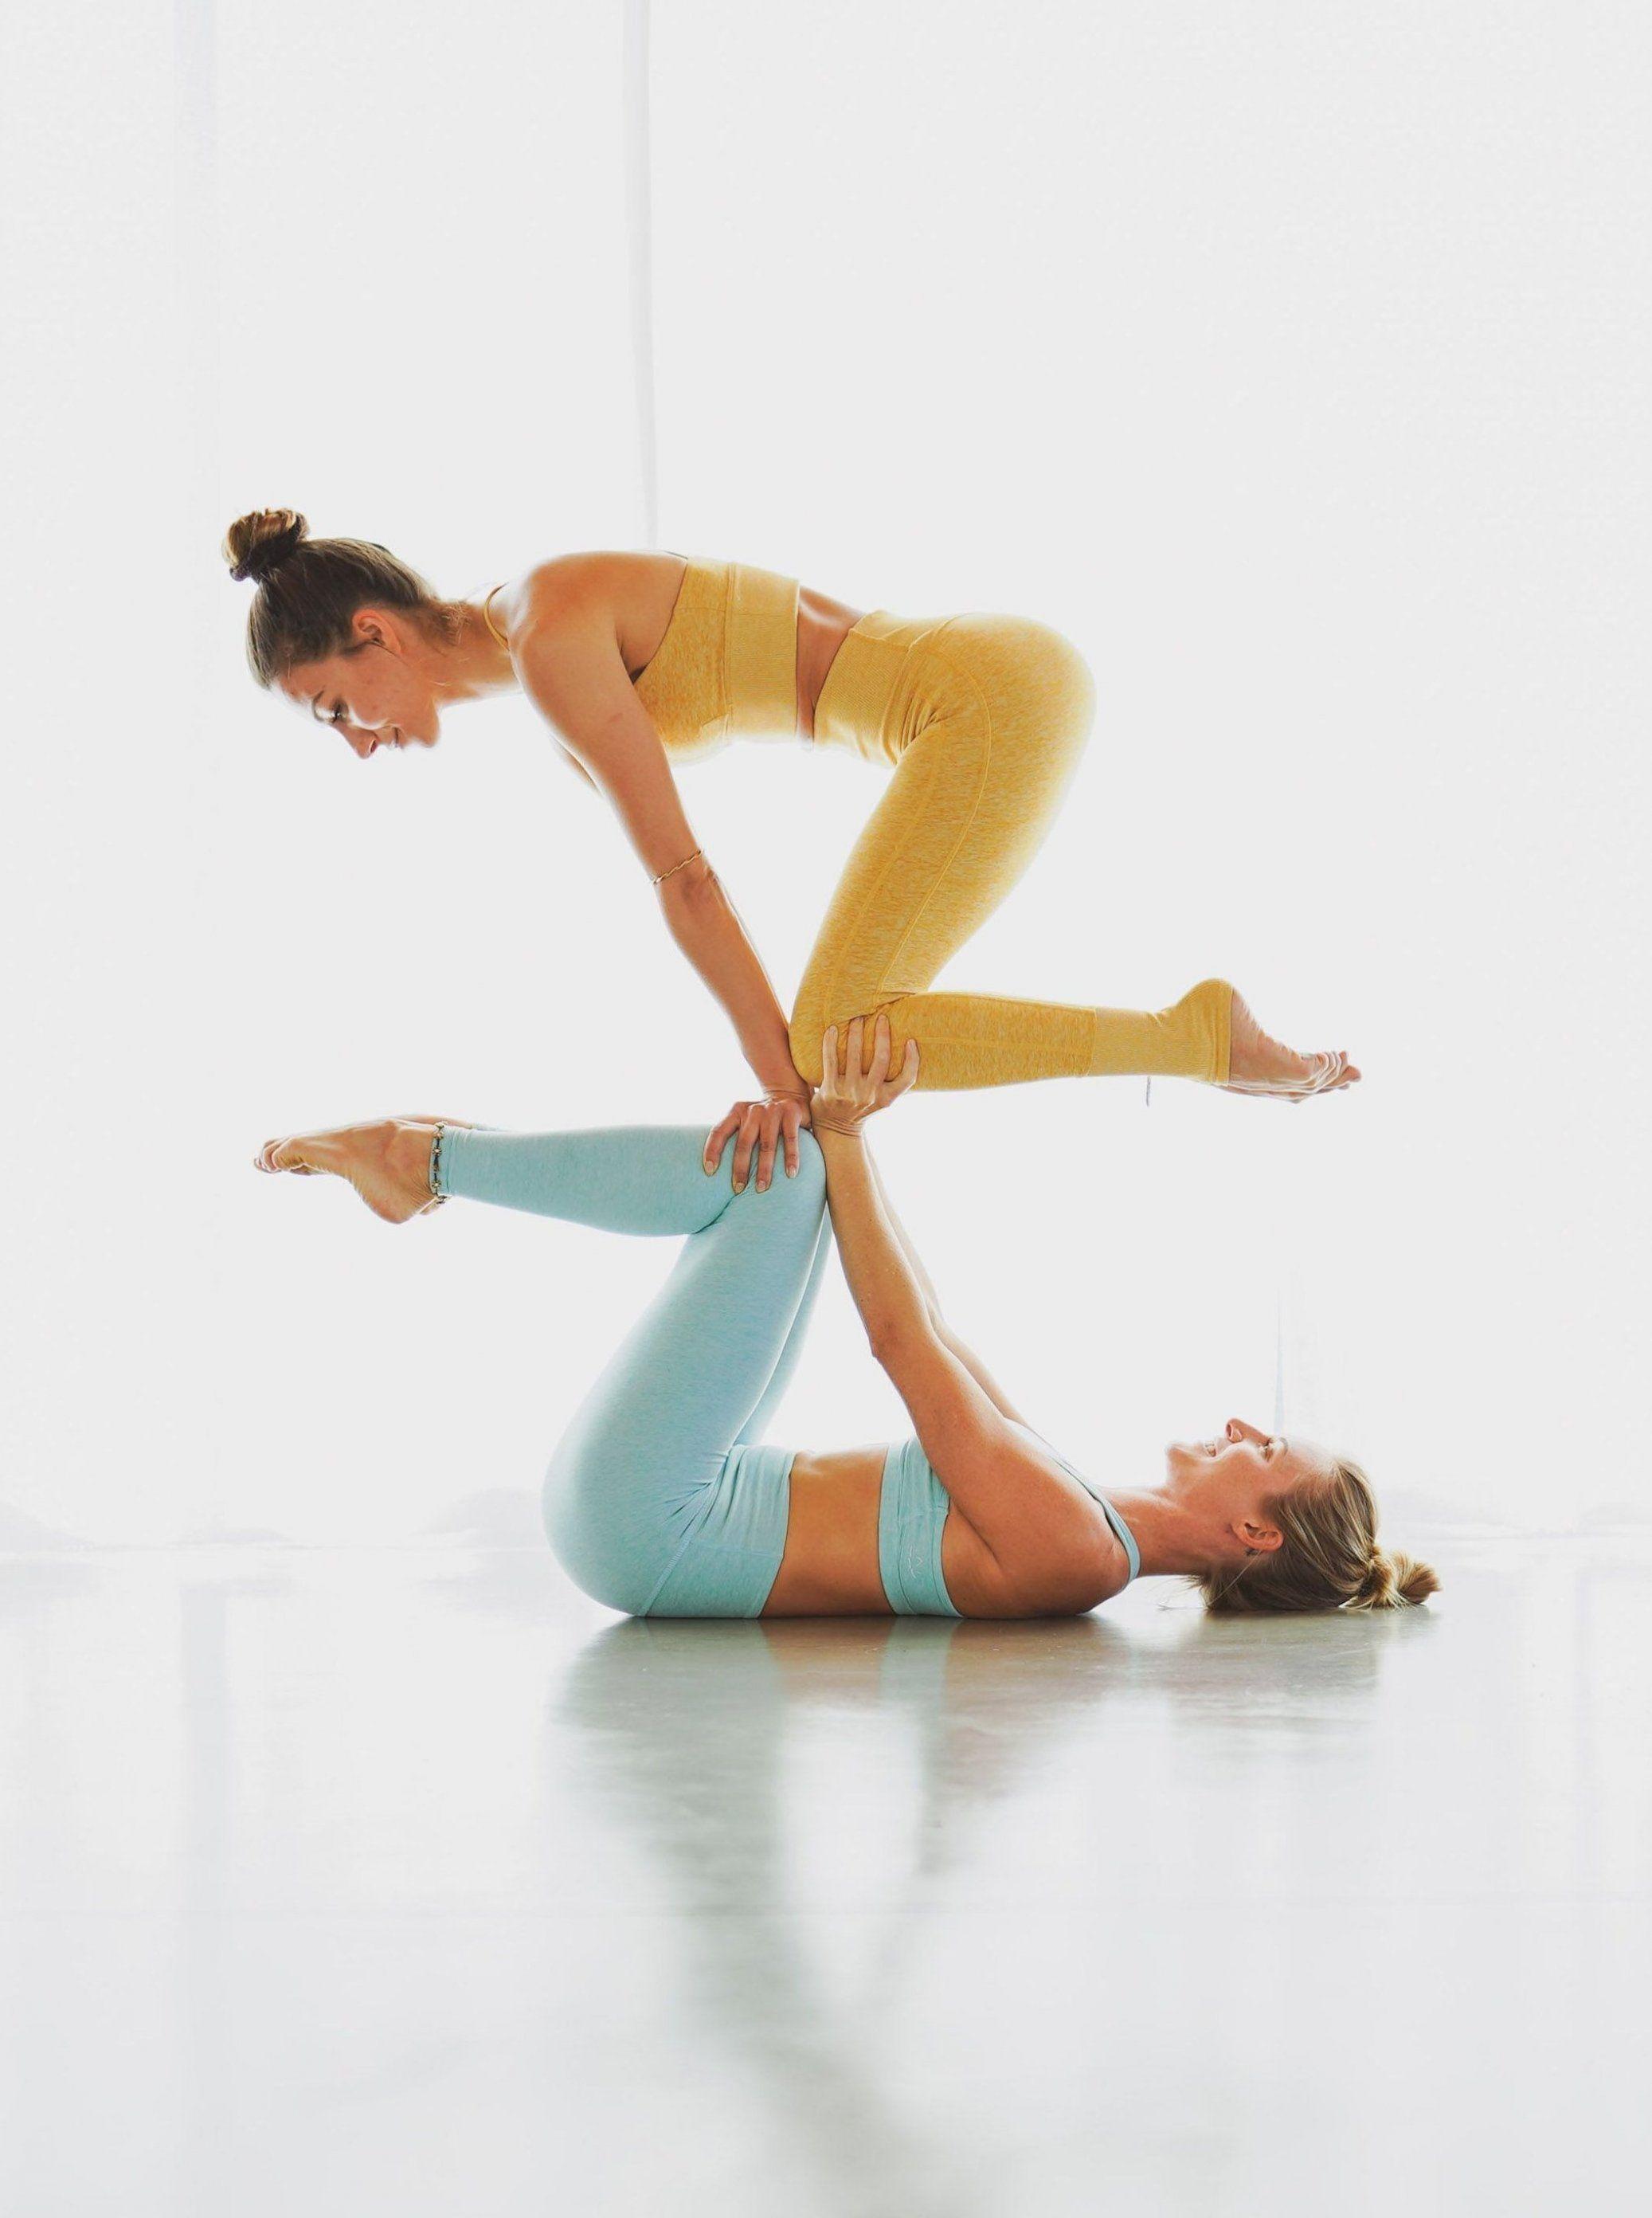 Yogaposen Partner Acro Yoga Yoga For 2 Workout Fitness Bodytransformation Couples Yoga Couples Yoga Poses Partner Yoga